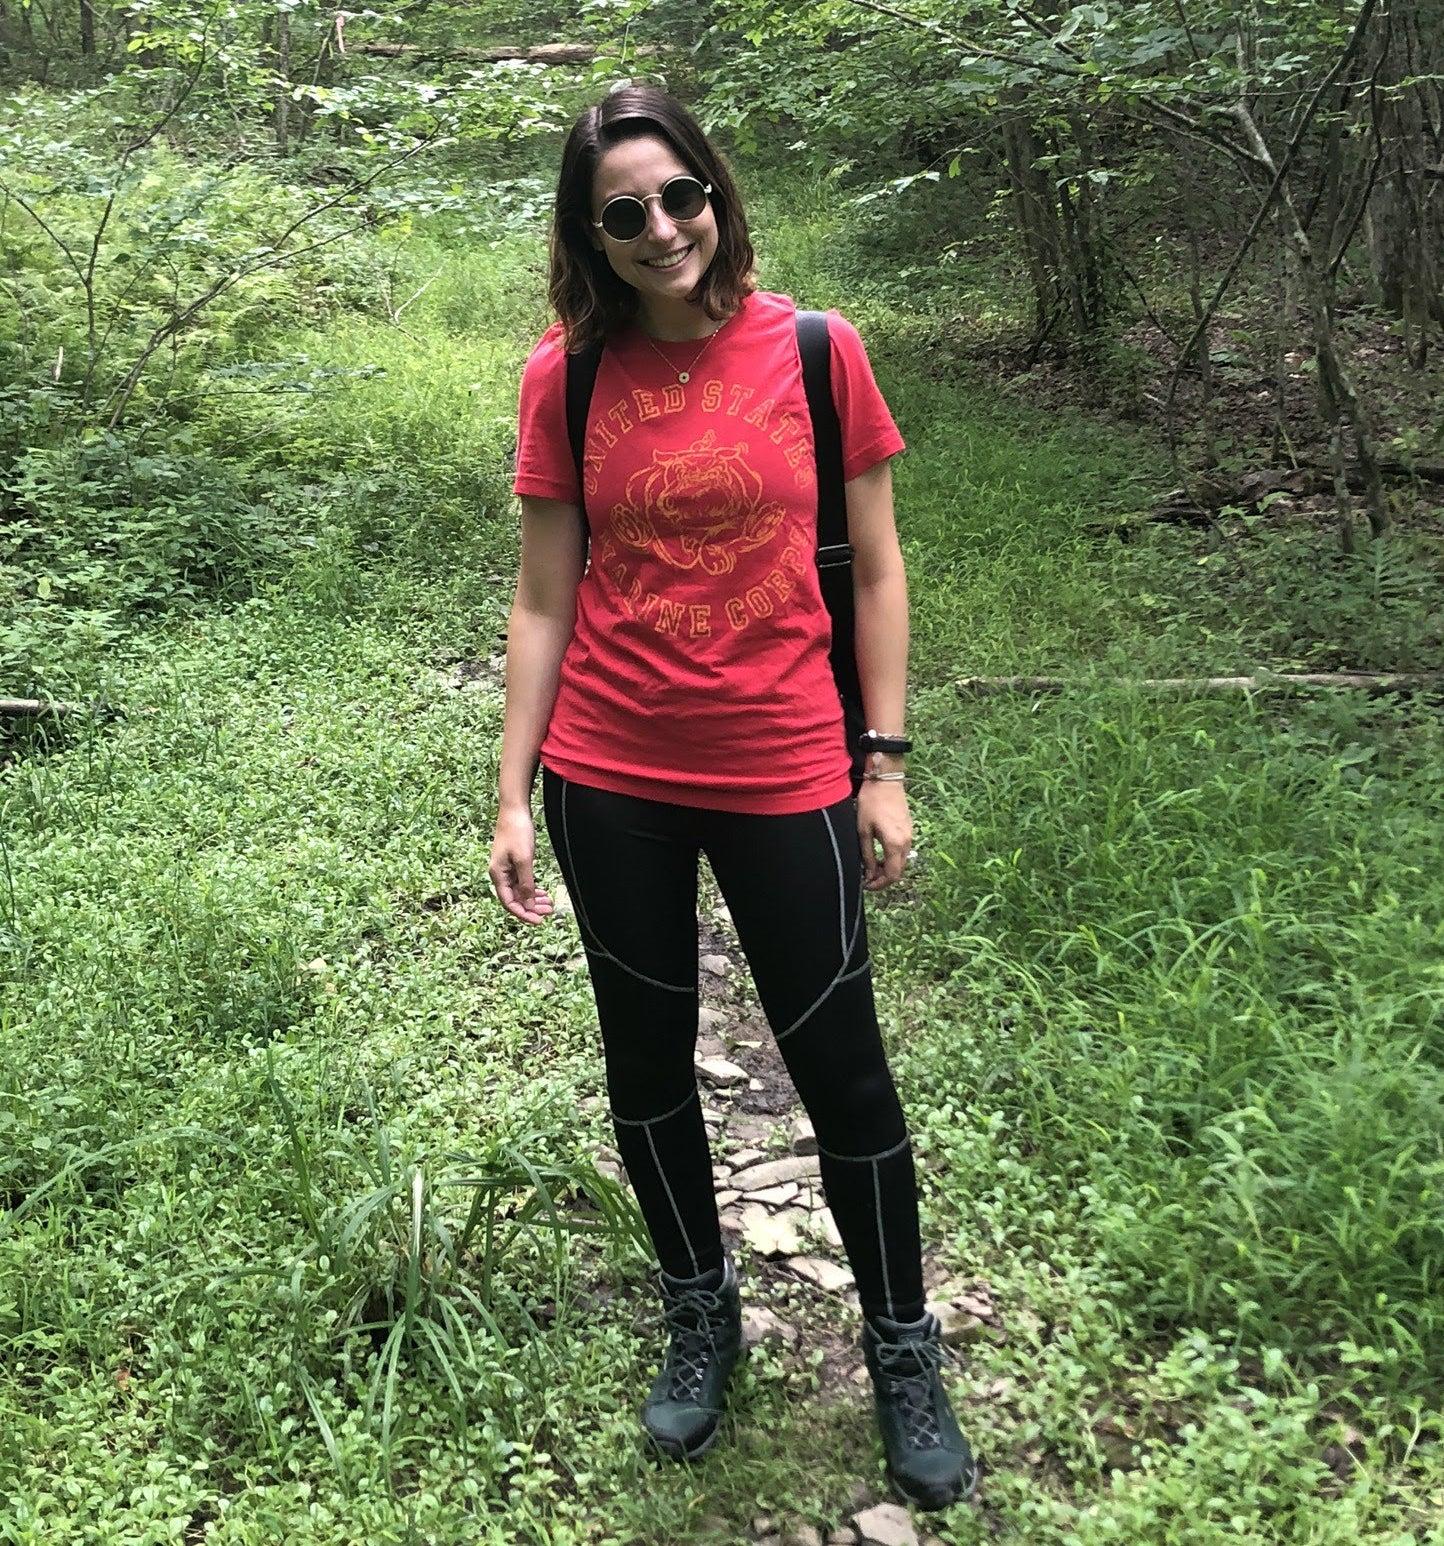 Genevieve standing in nature